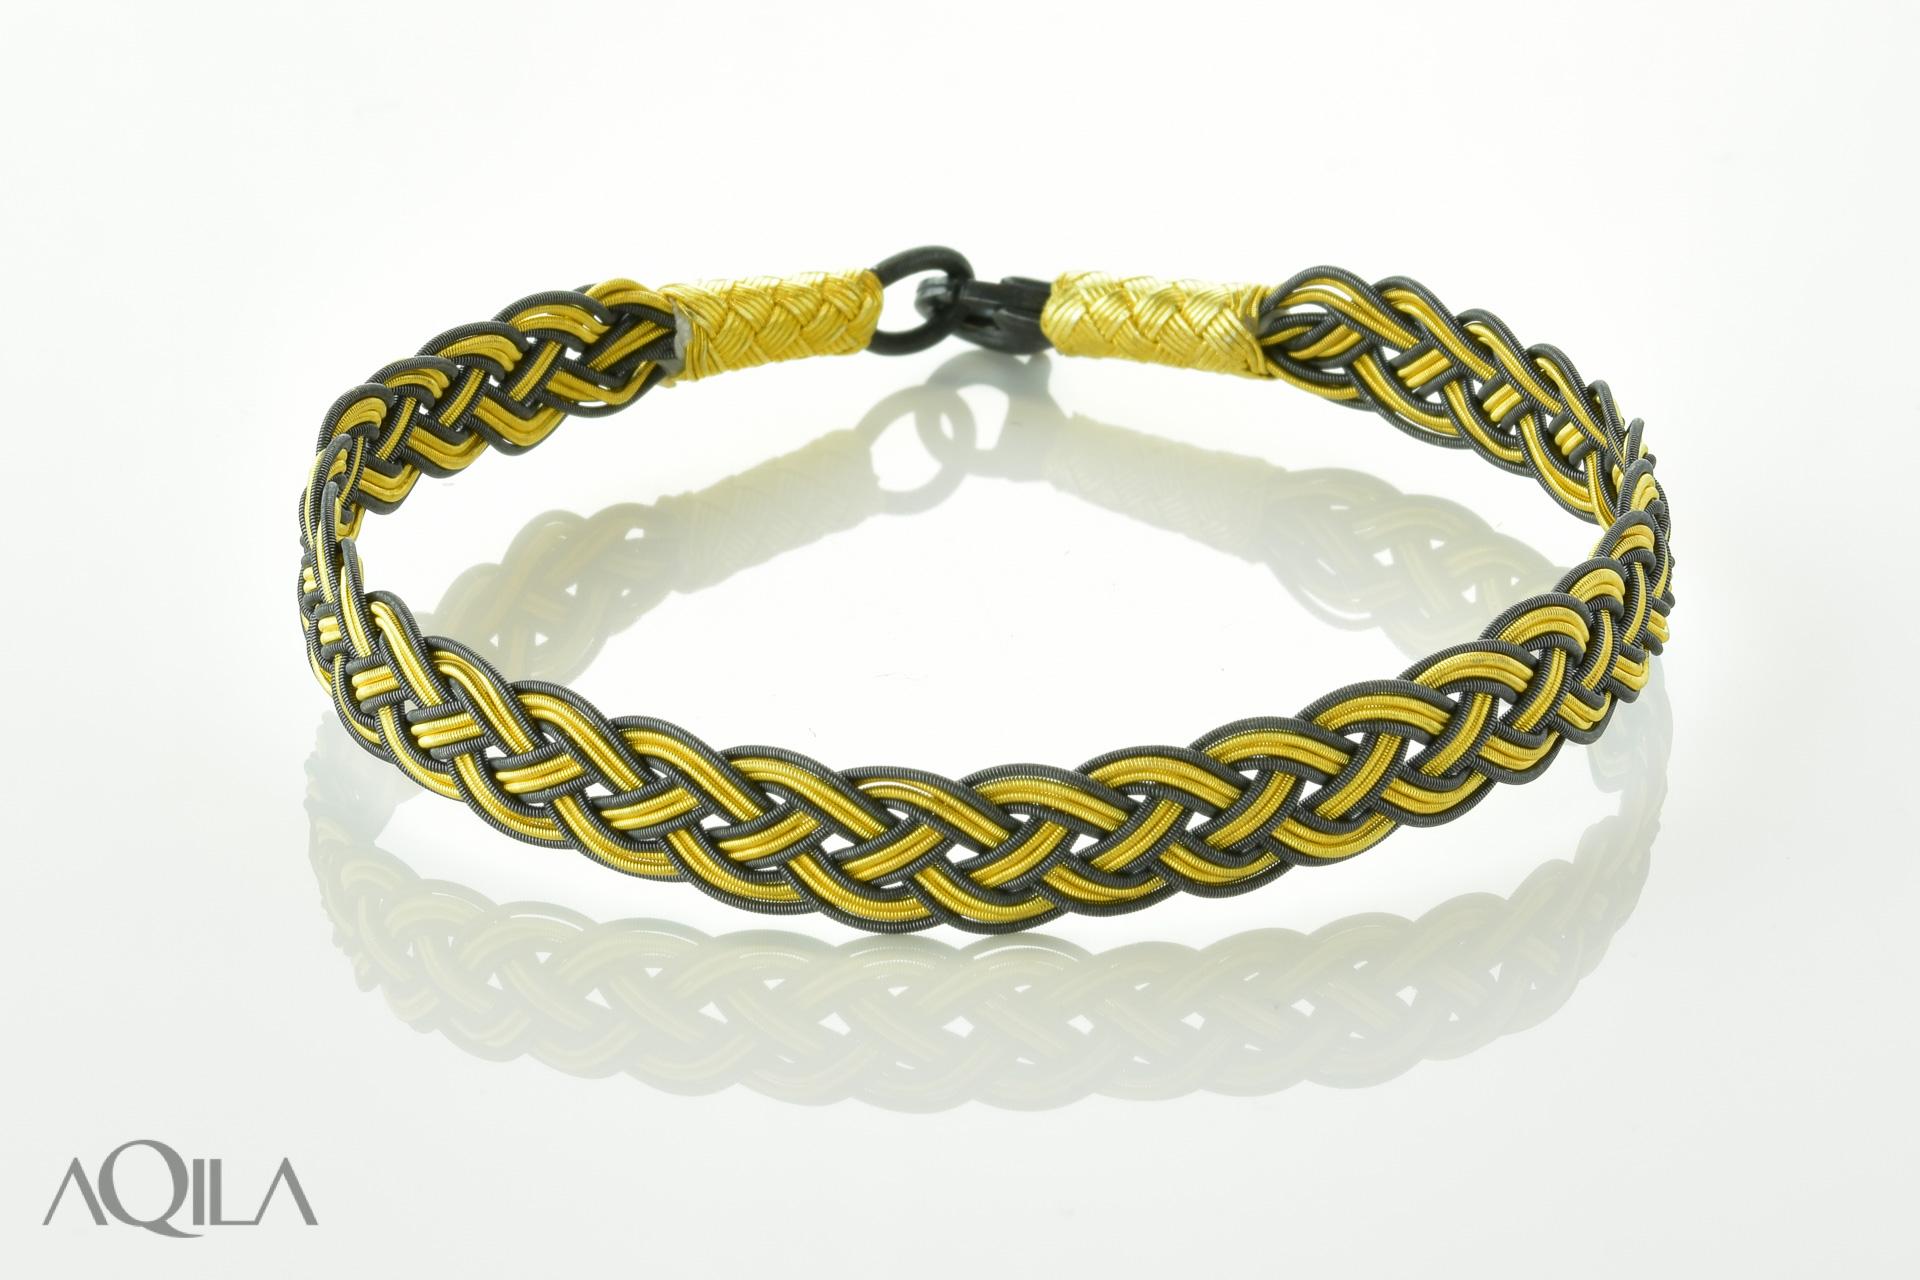 AQILA   999er Silber Armband, Kazaziye, Feinsilber, handarbeit ...